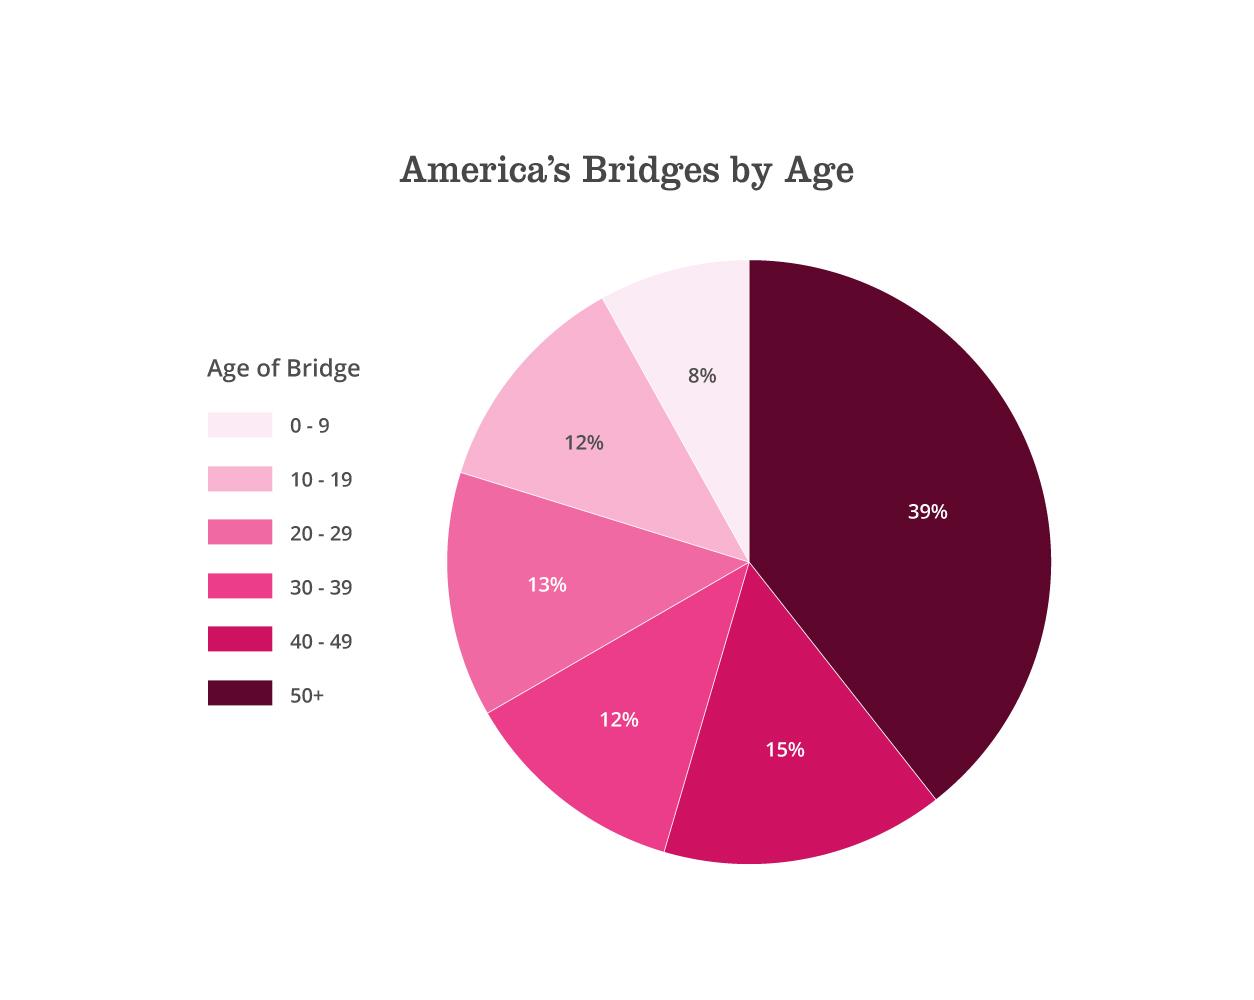 America's bridges by age